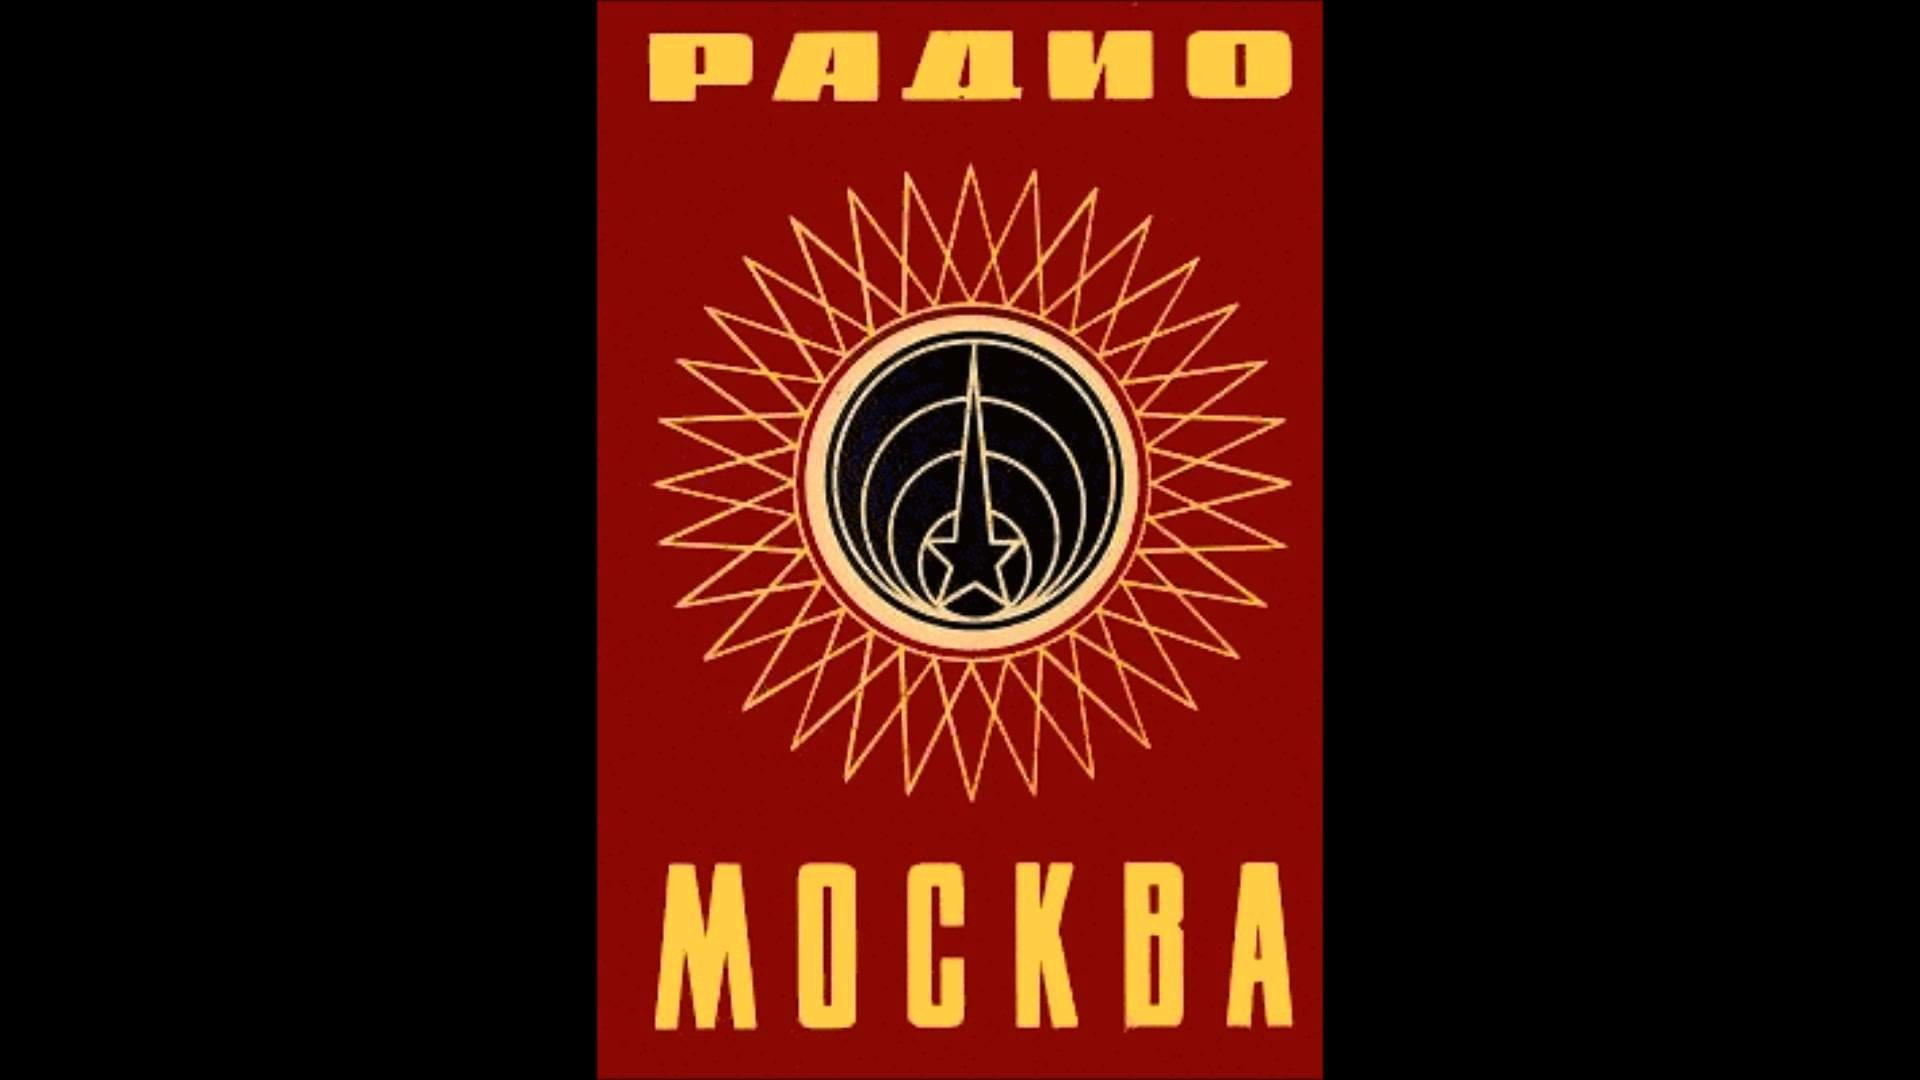 Radio Moscow announces Yuri Gagarin's flight (in English)